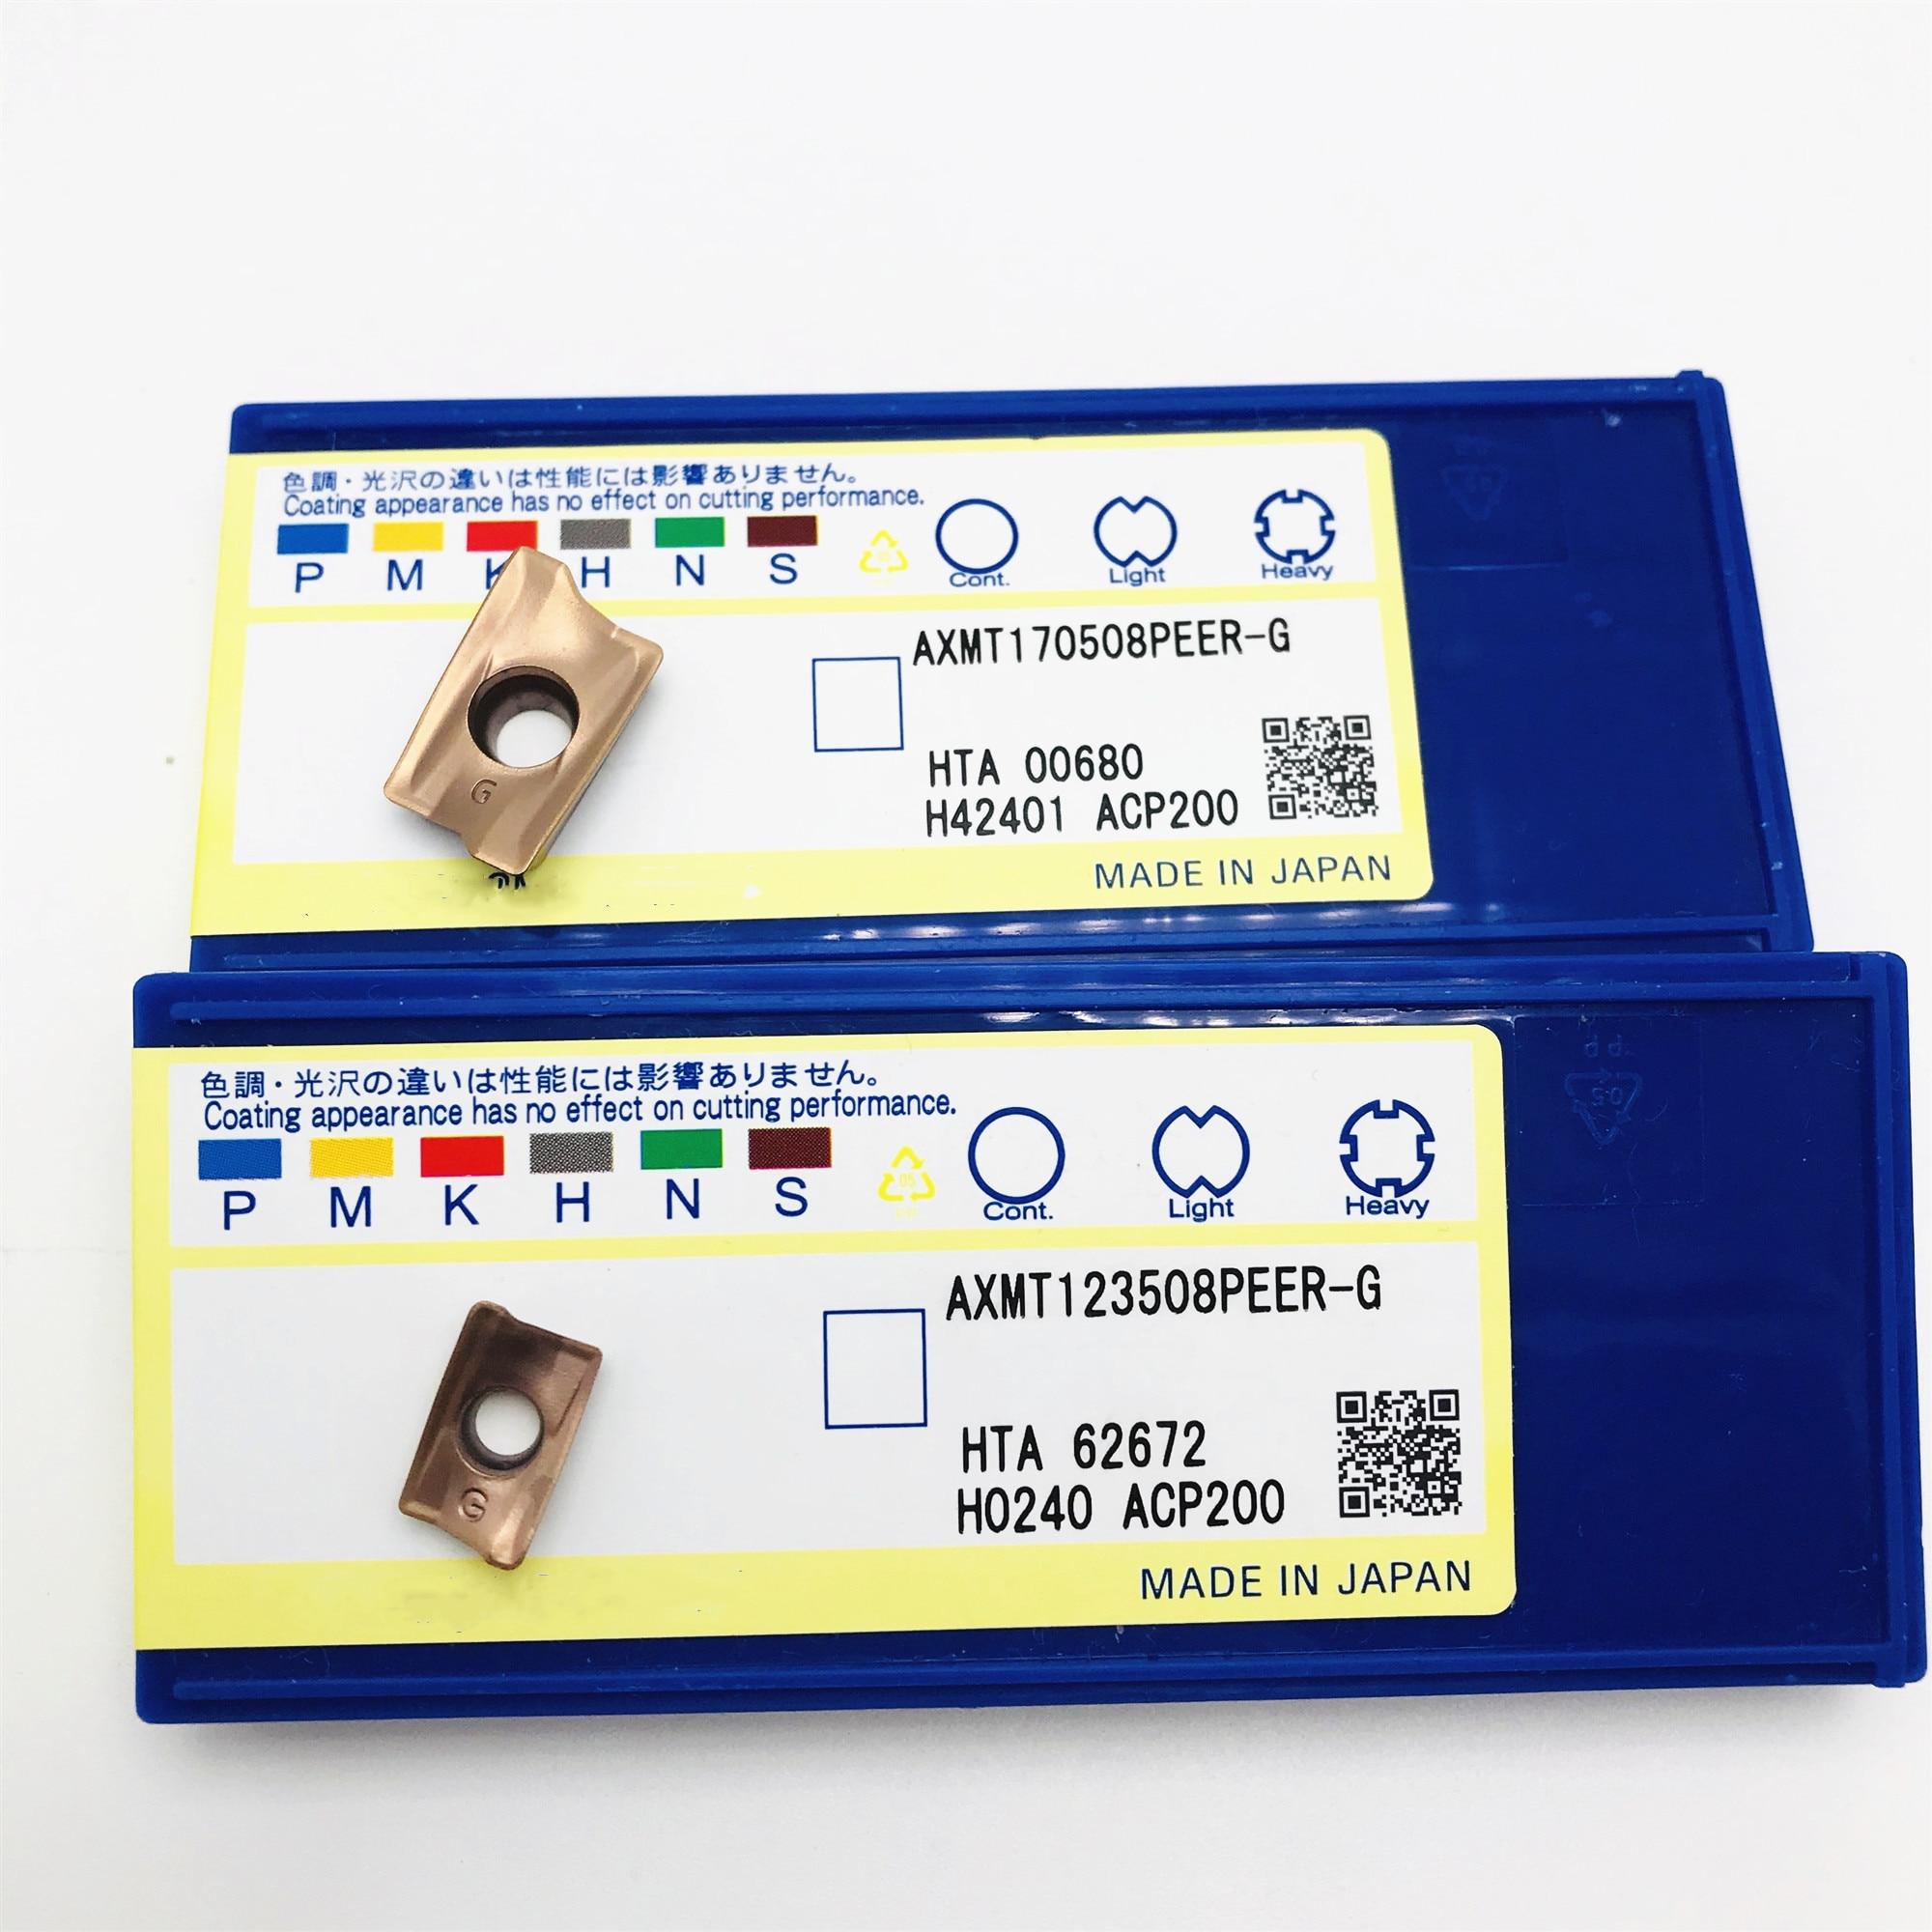 AXMT123508 / 170508PEER-G ACP200 High quality metal internal turning tool CNC lathe tool AXMT Carbide cutting tool turning tool